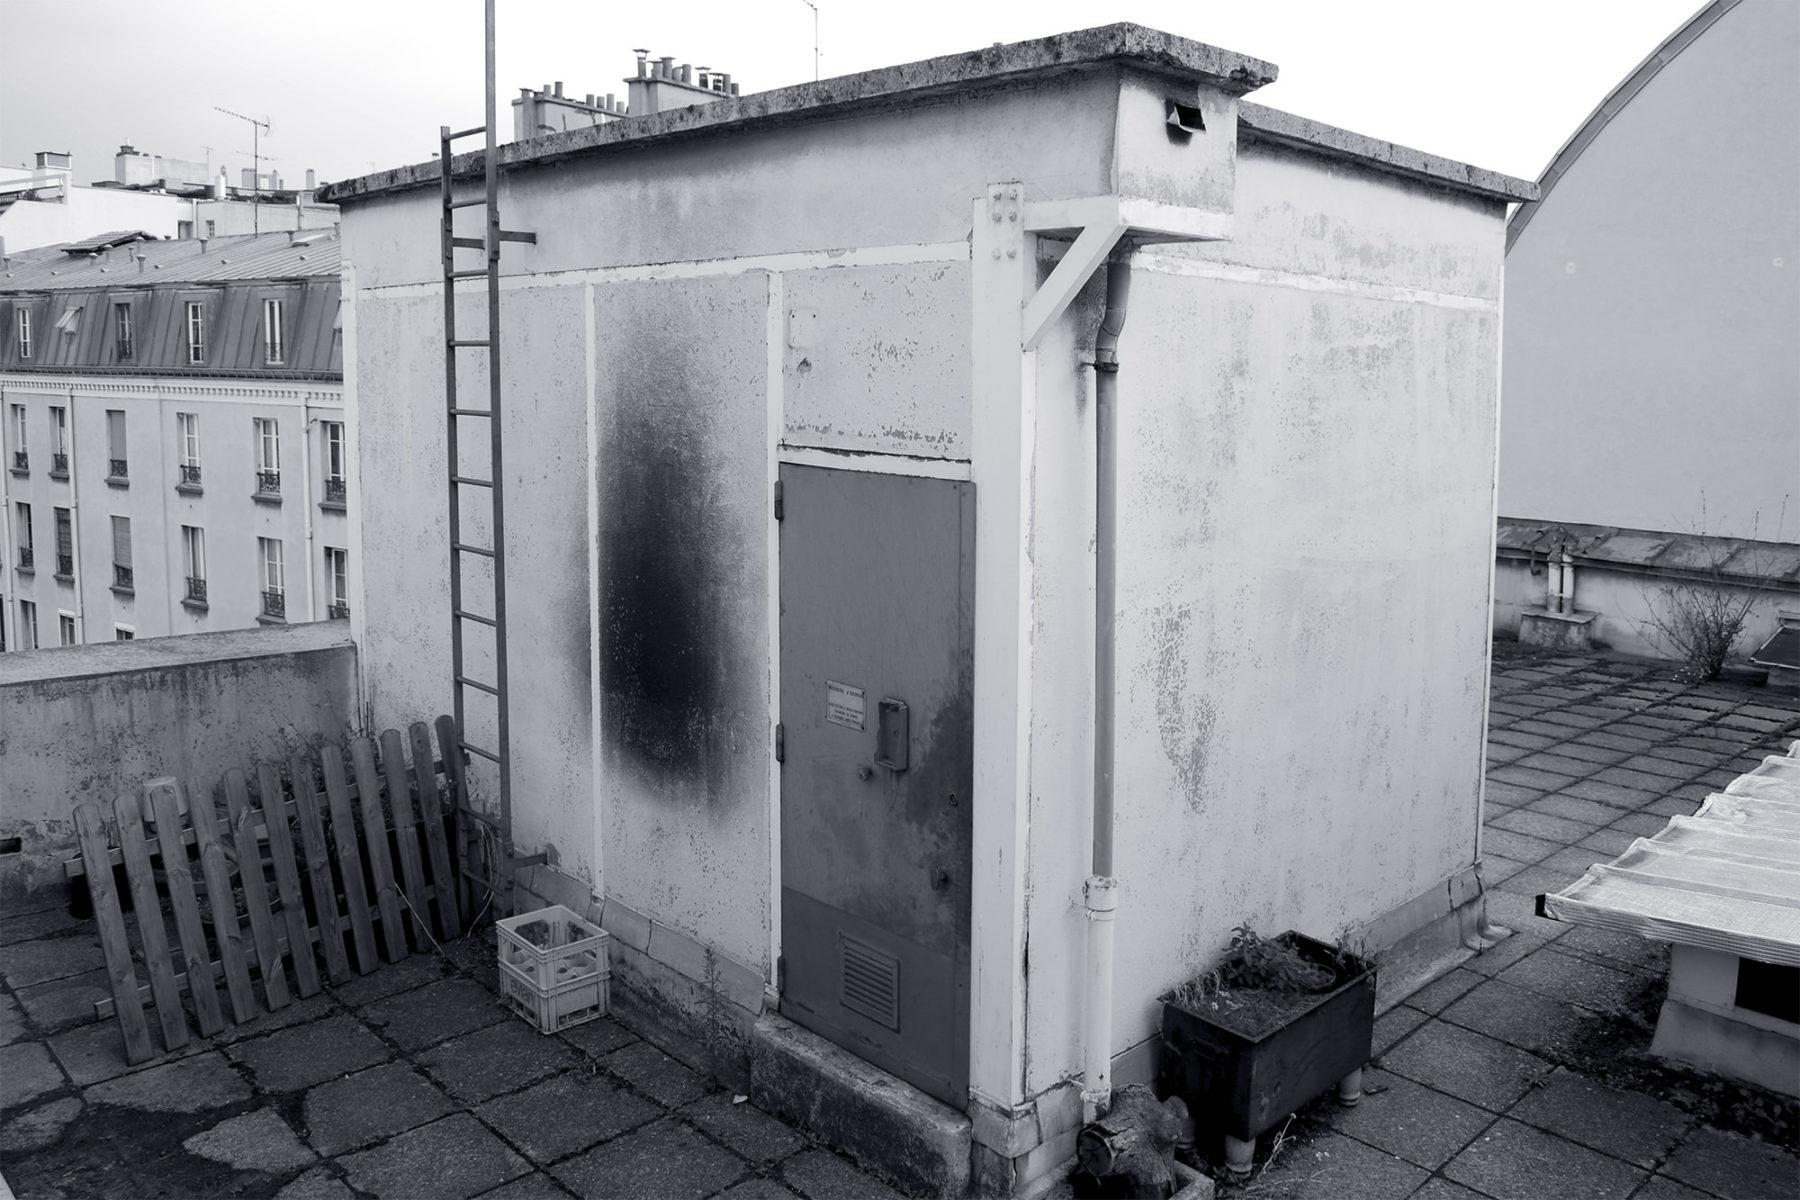 www.bold-design.fr - atelier sur les toits - making of - photo bold-design